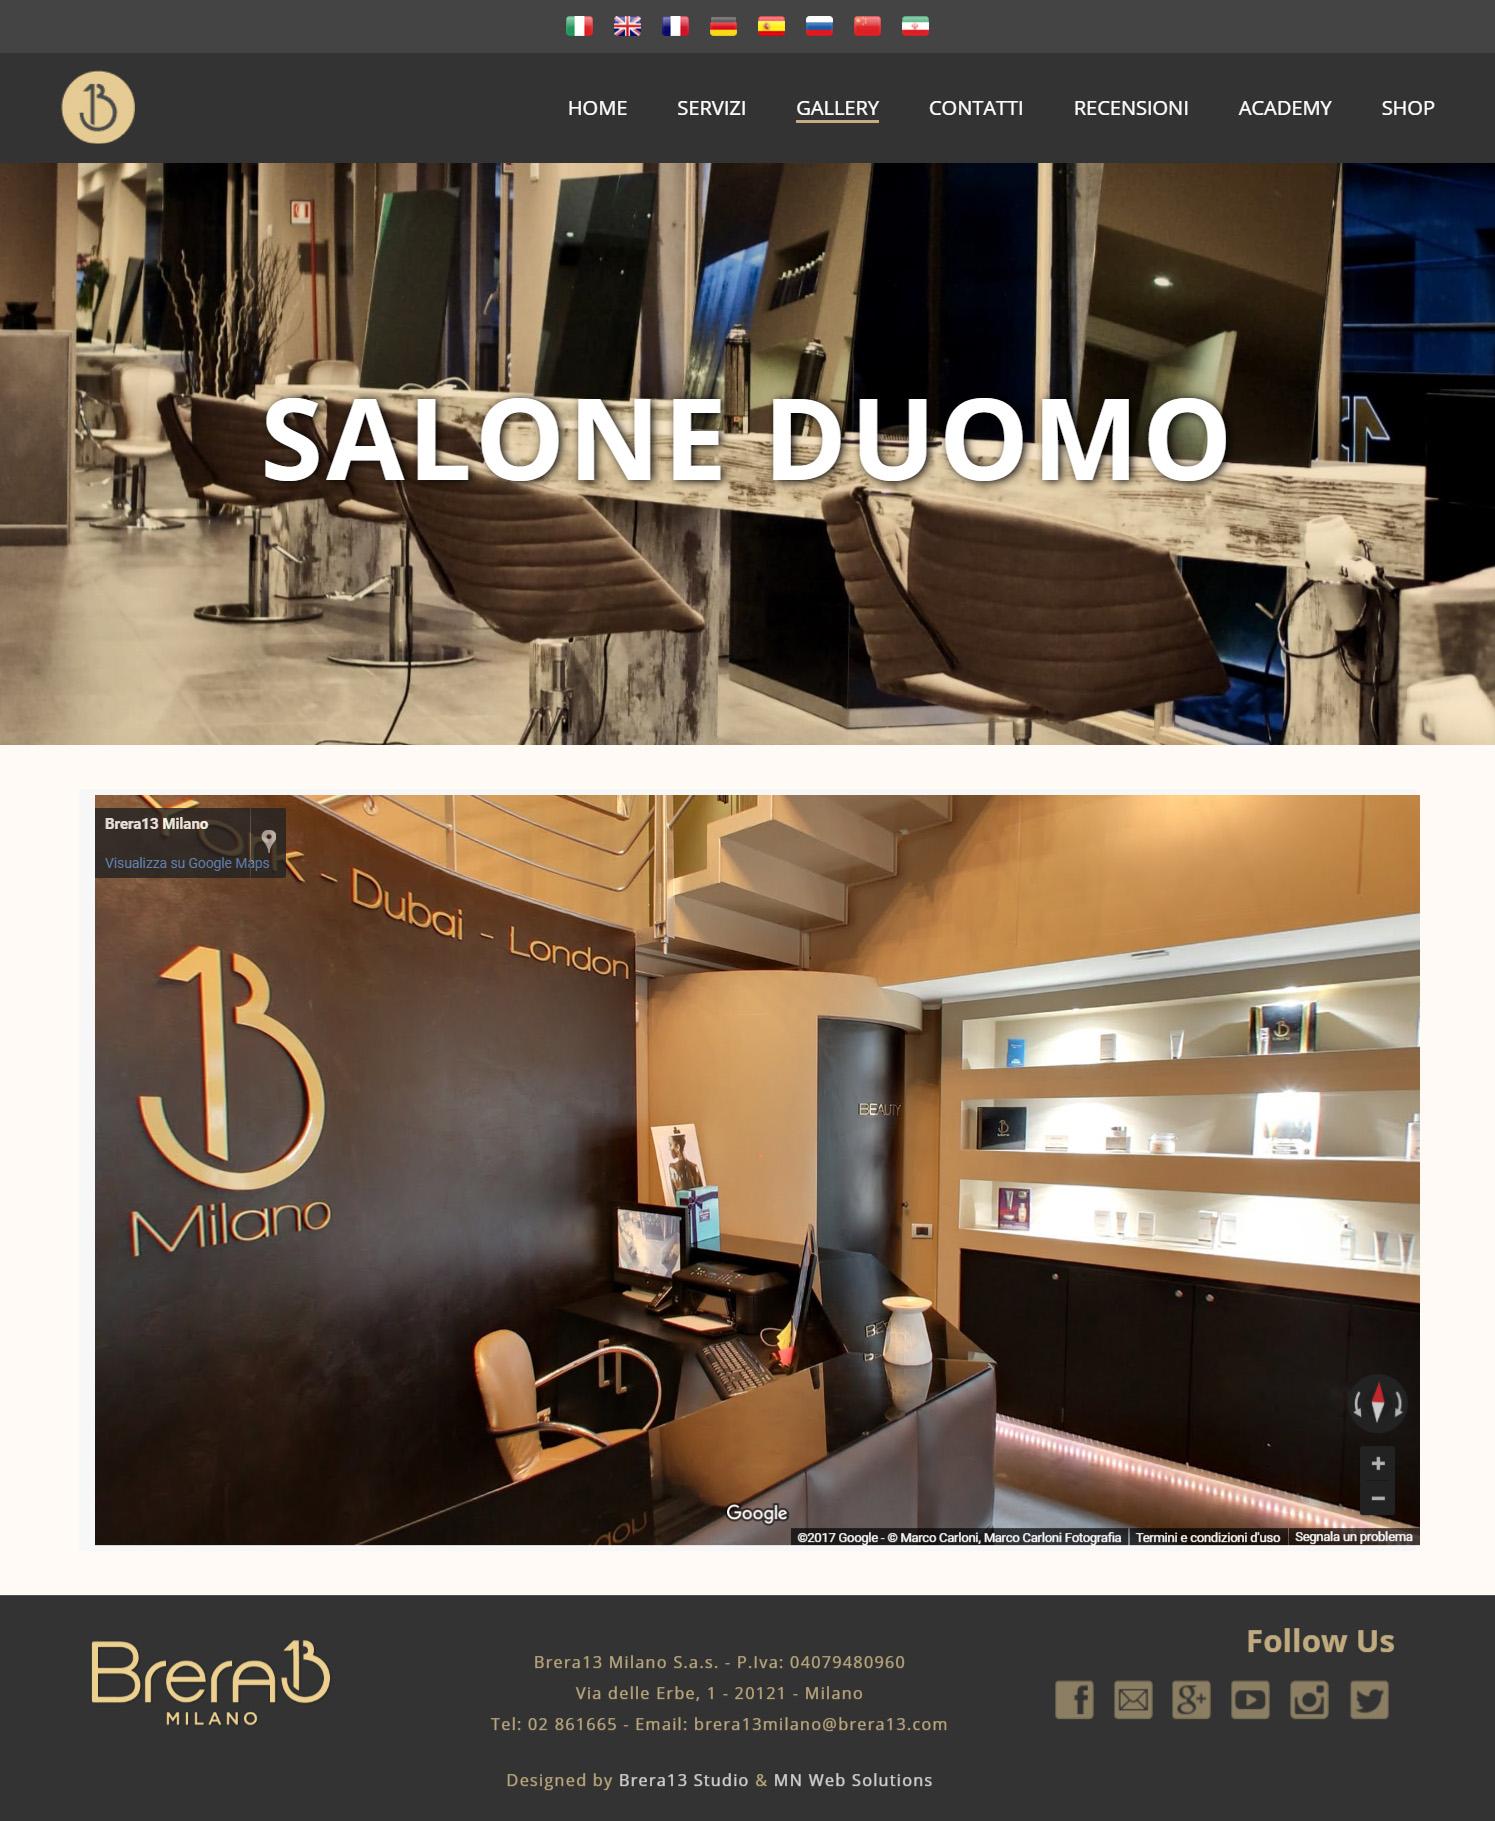 screencapture-brera13milano-gallery-salone-duomo-tour-3d-duomo-1494607614687